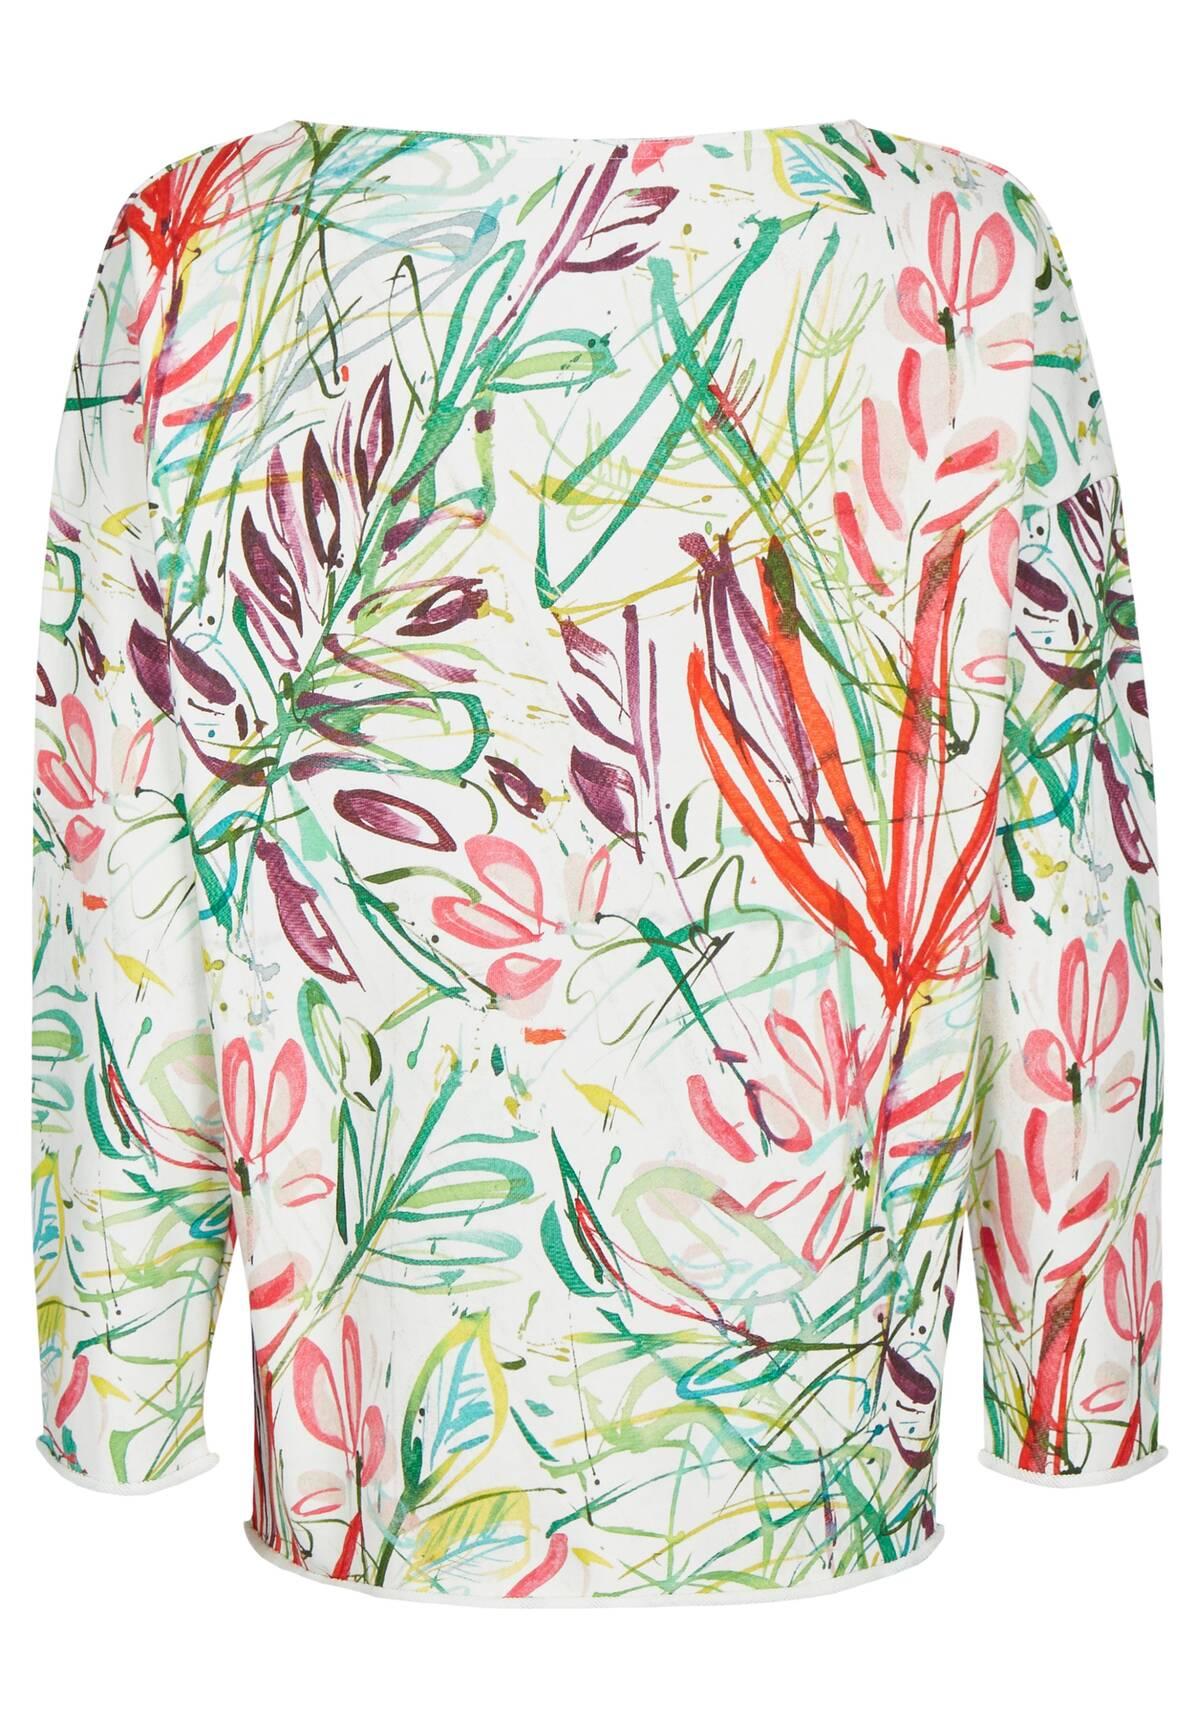 Florales Shirt / Sweatshirt